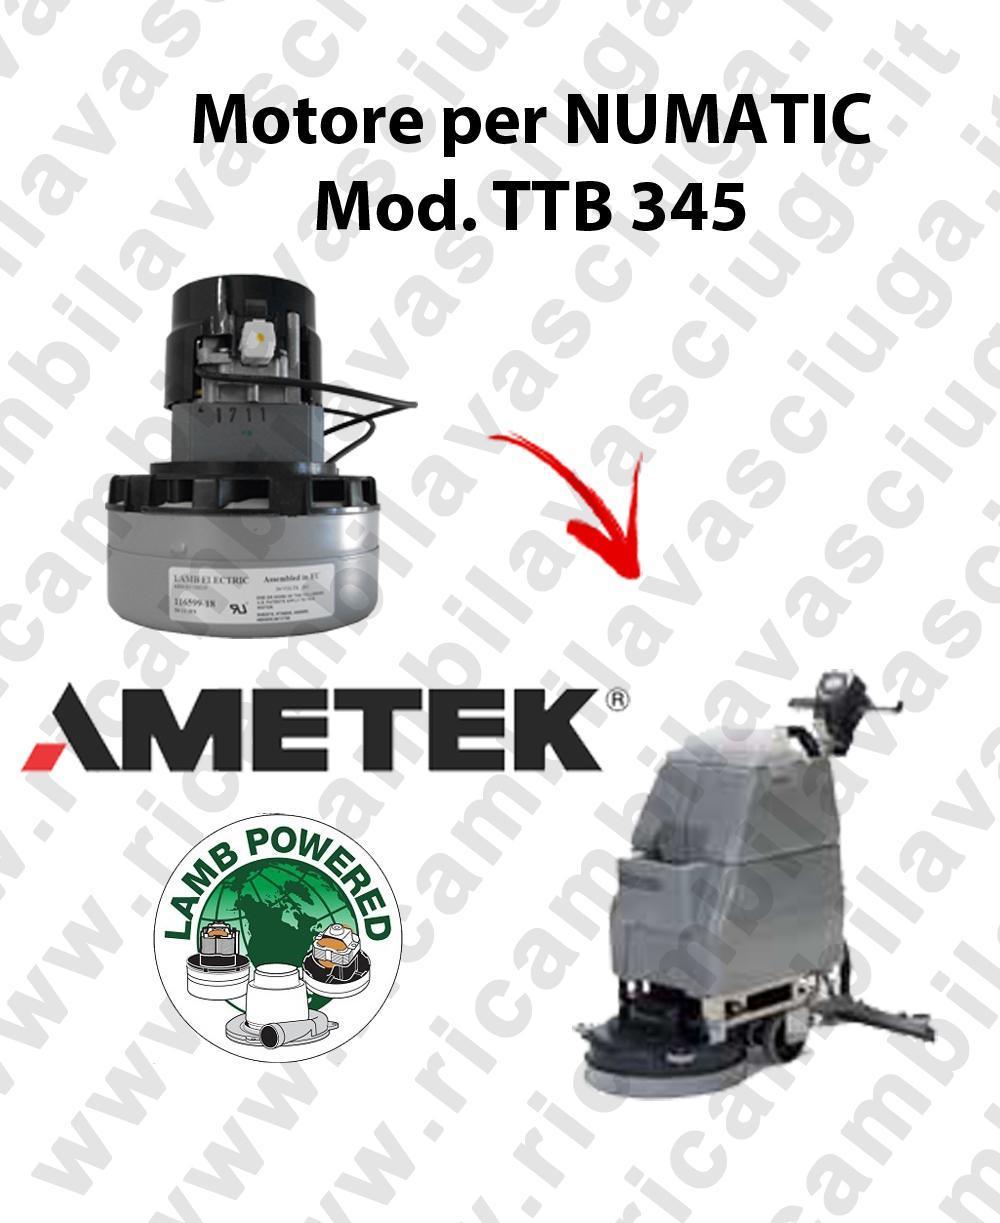 TTB 345 motor de aspiración AMETEK fregadora NUMATIC